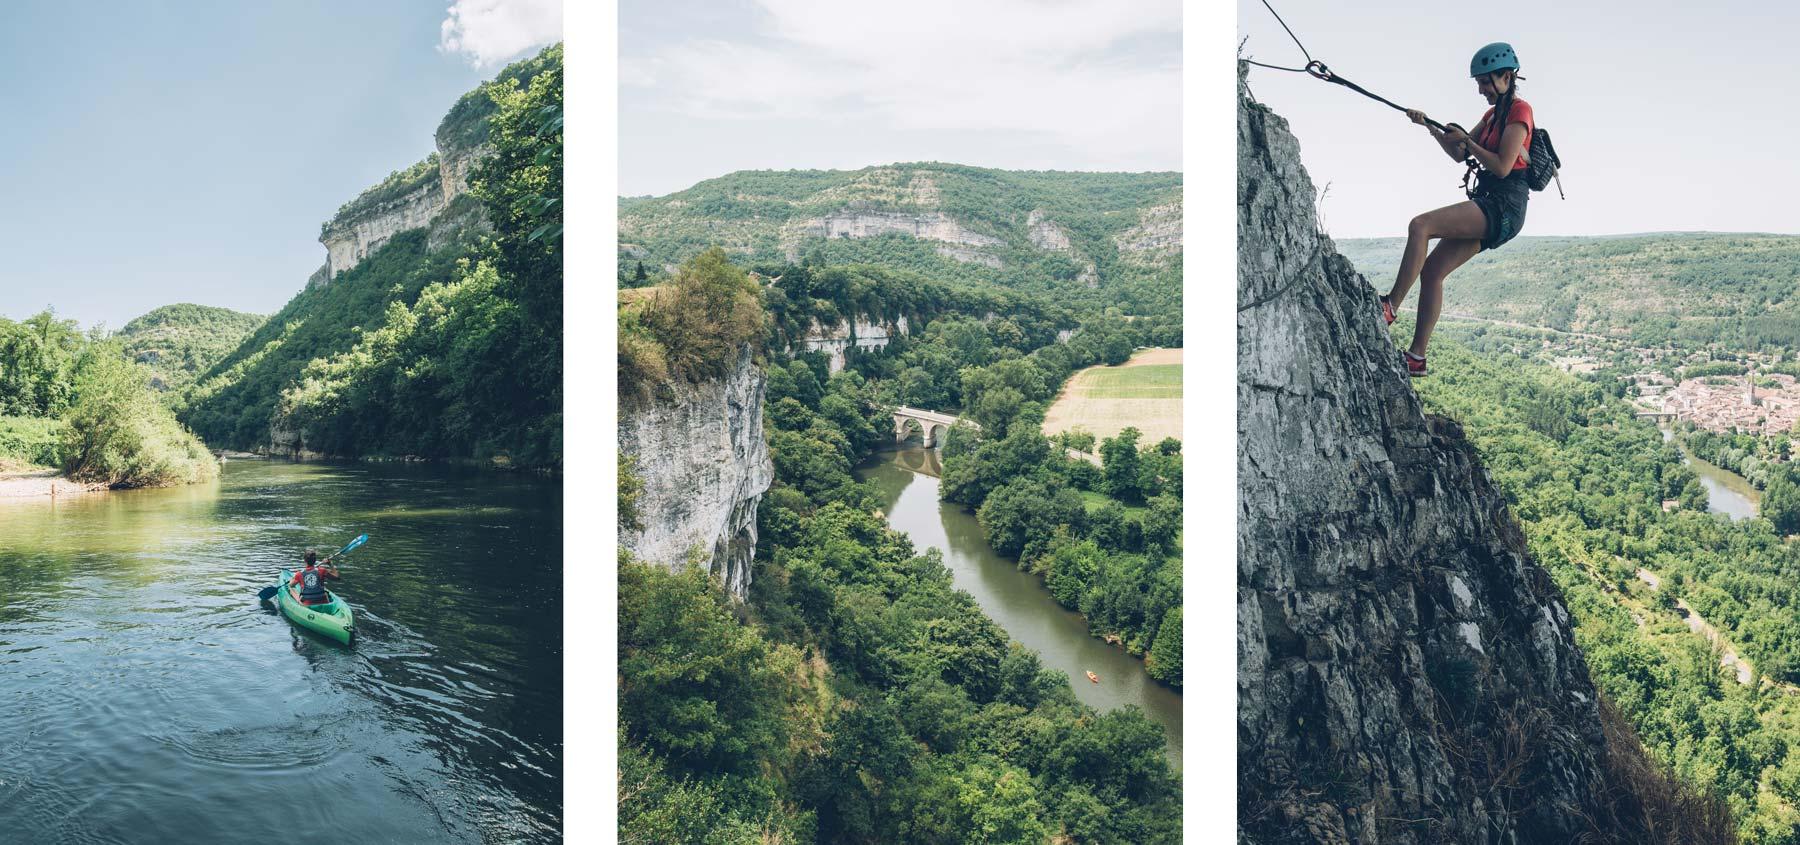 Gorge de l'Aveyron, Canoe ou Via Ferrata?